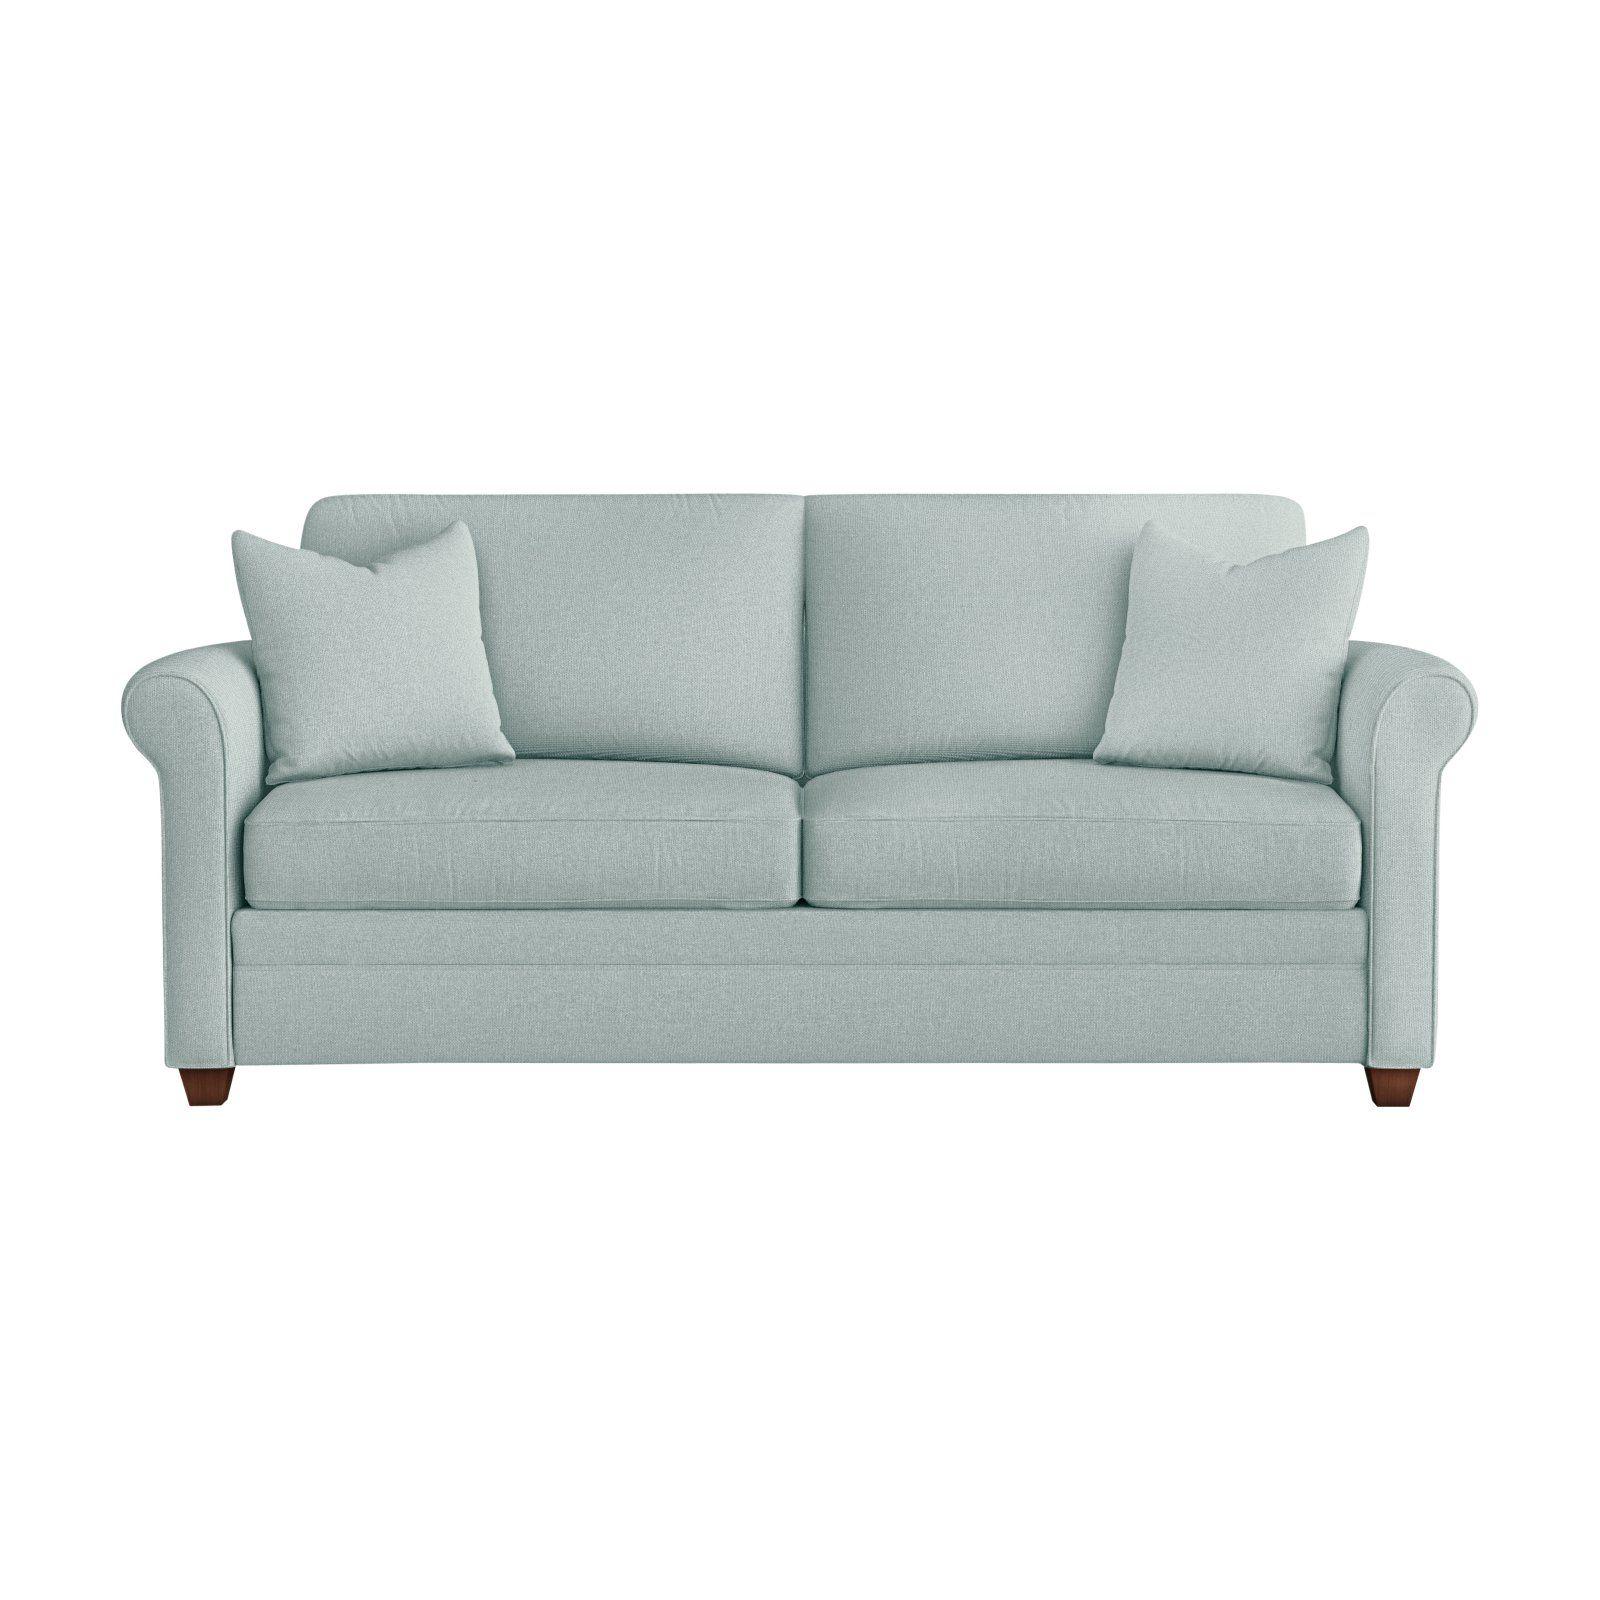 Klaussner Davidson Upholstered Sleeper Sofa Light Blue Sleeper Sofa Sofa Upholstered Sofa